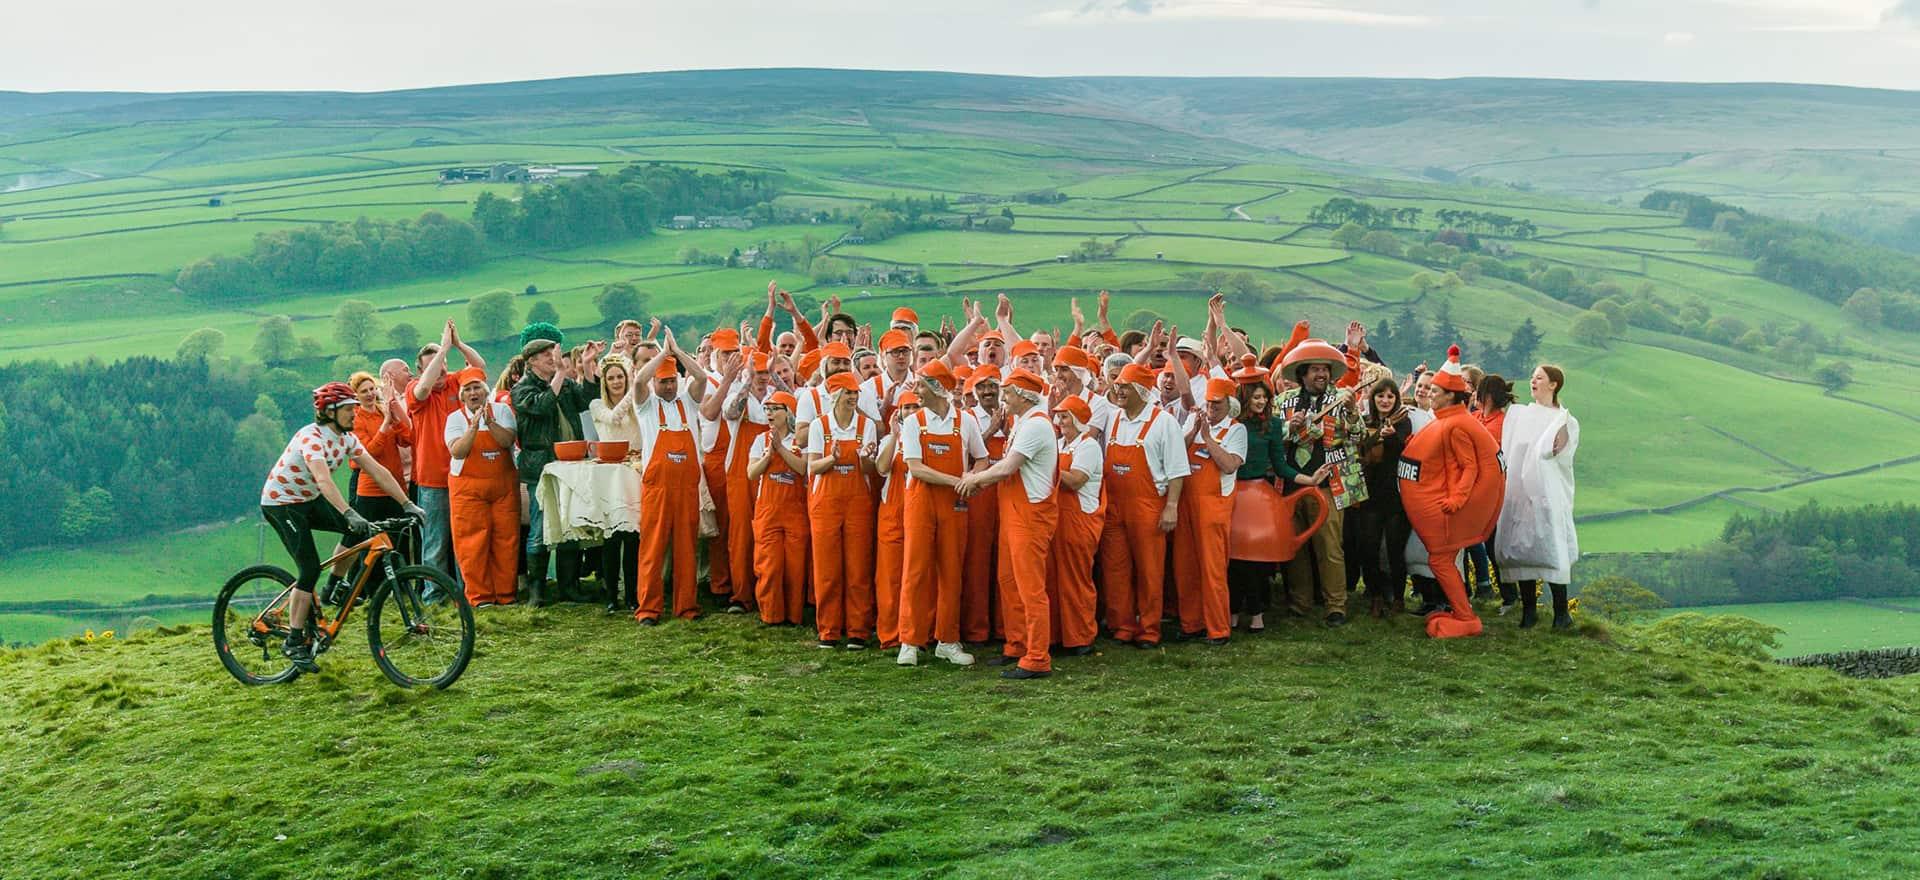 Yorkshire-tea-marketing-brand- FMCG advertising, retail advertising, Food and drink advertising, shopper advertising